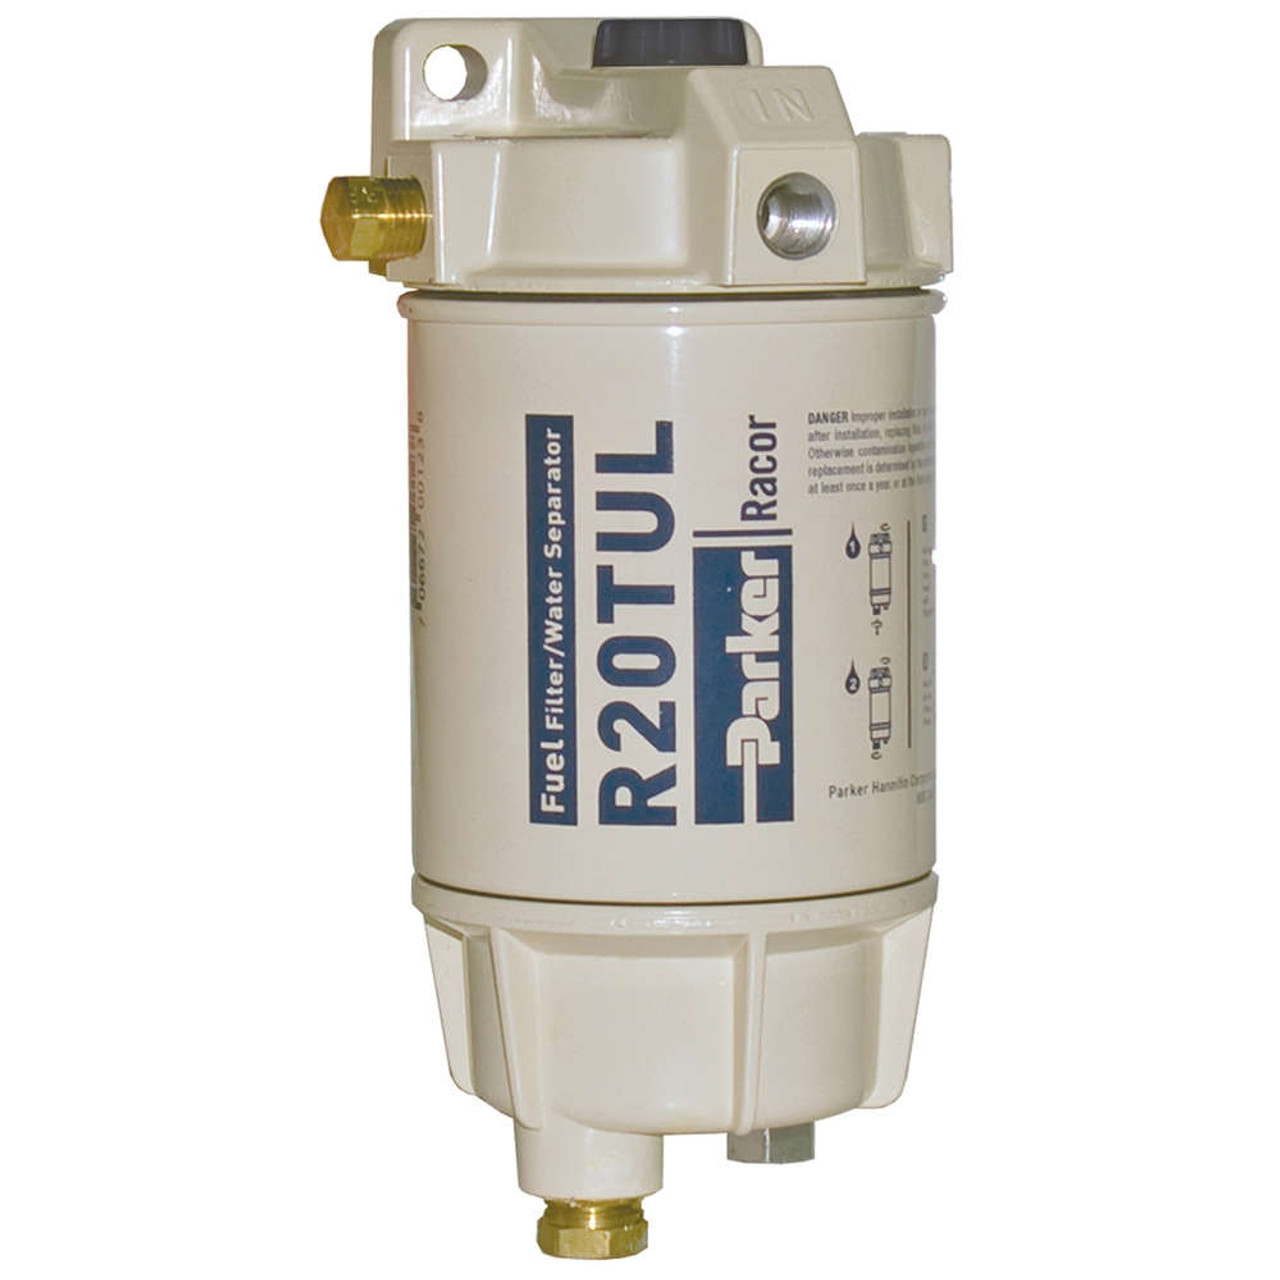 30 gph aquabloc marine spin-on type diesel fuel